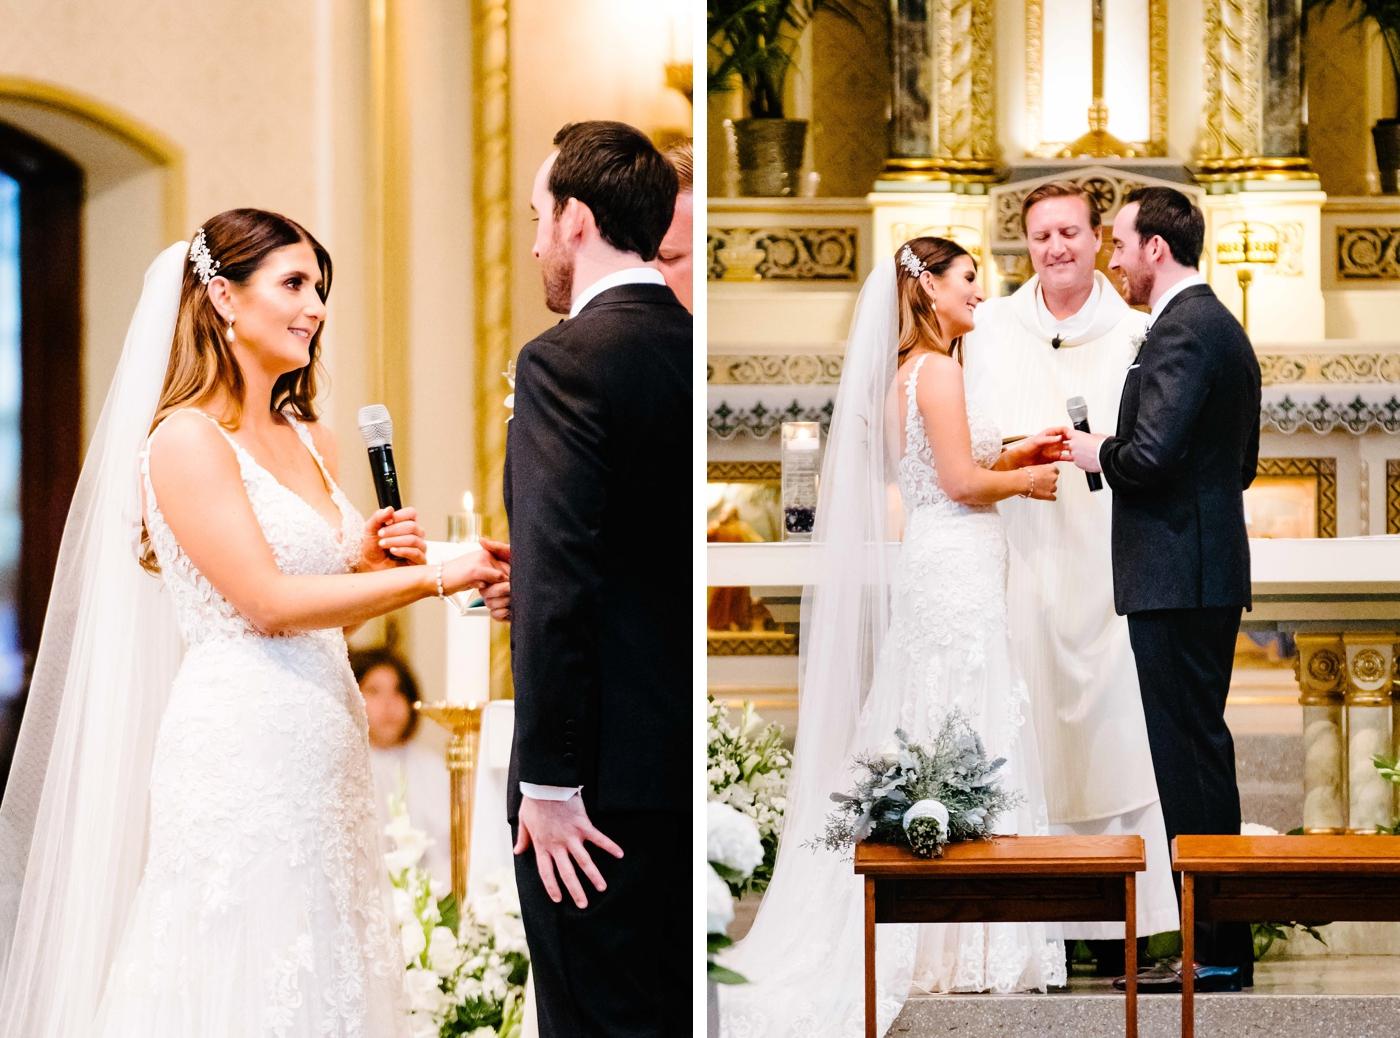 chicago-fine-art-wedding-photography-duncan41